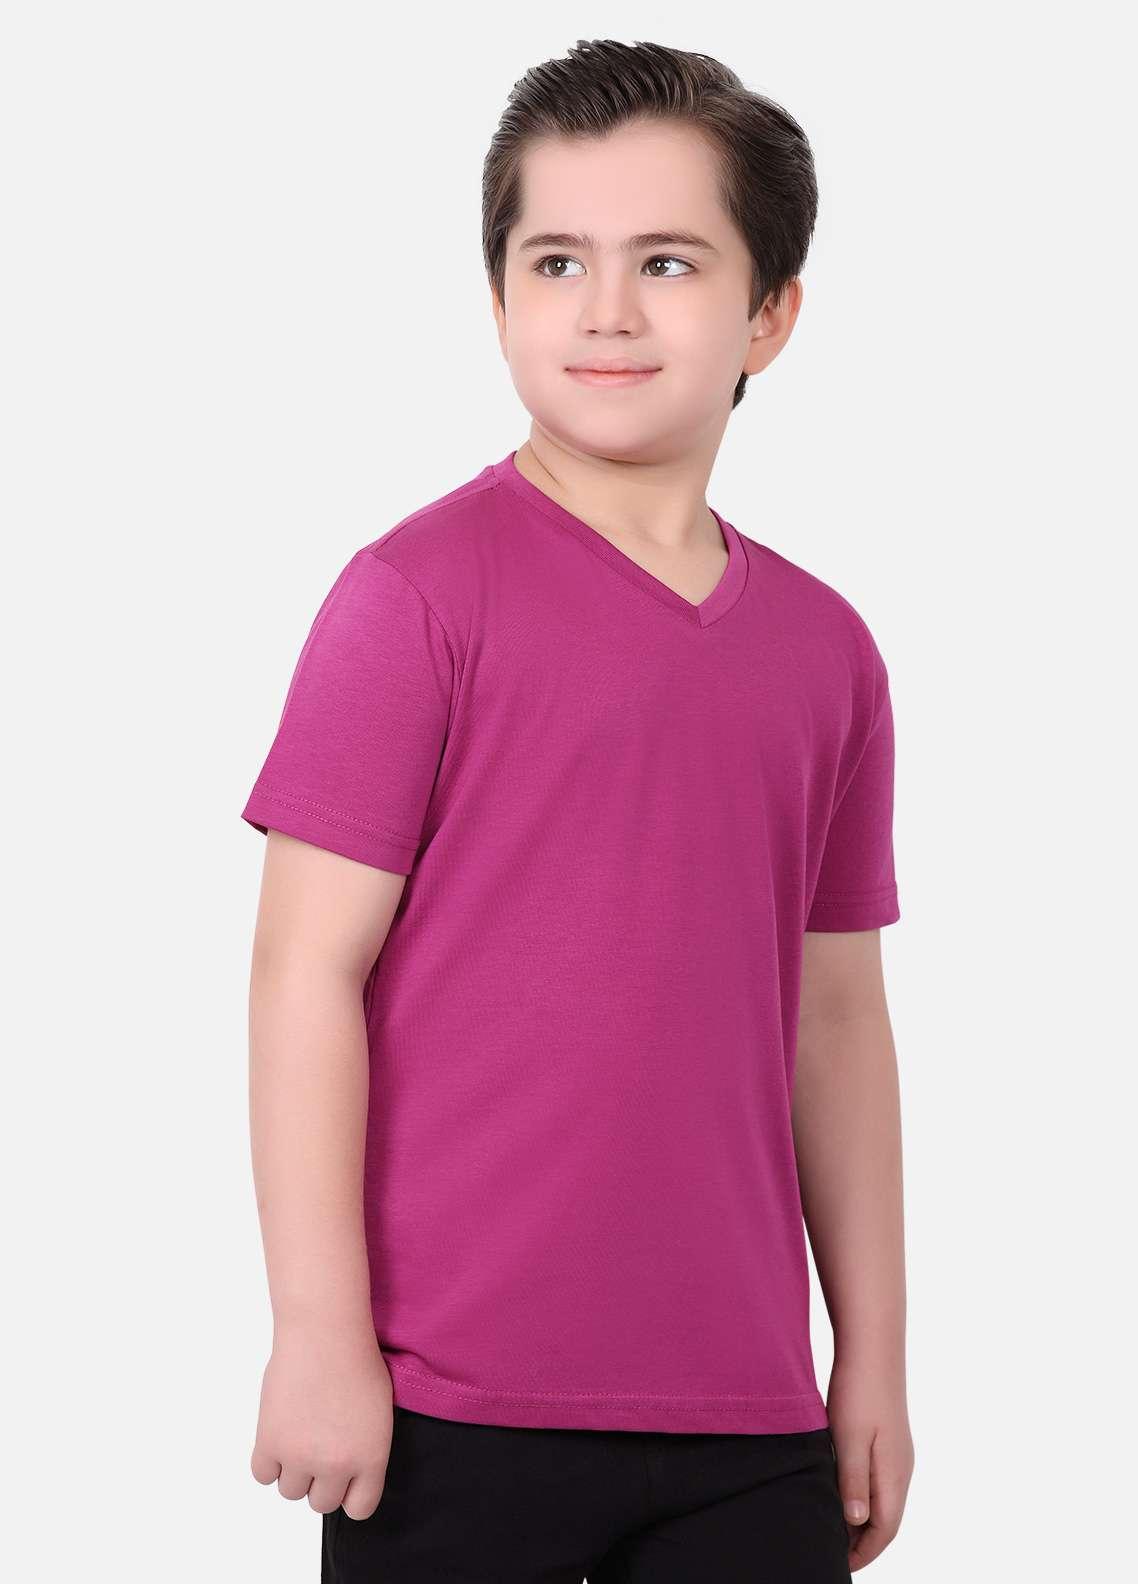 b48bb9821 Edenrobe Cotton Casual Boys T-Shirts - Purple EDK18TS 016